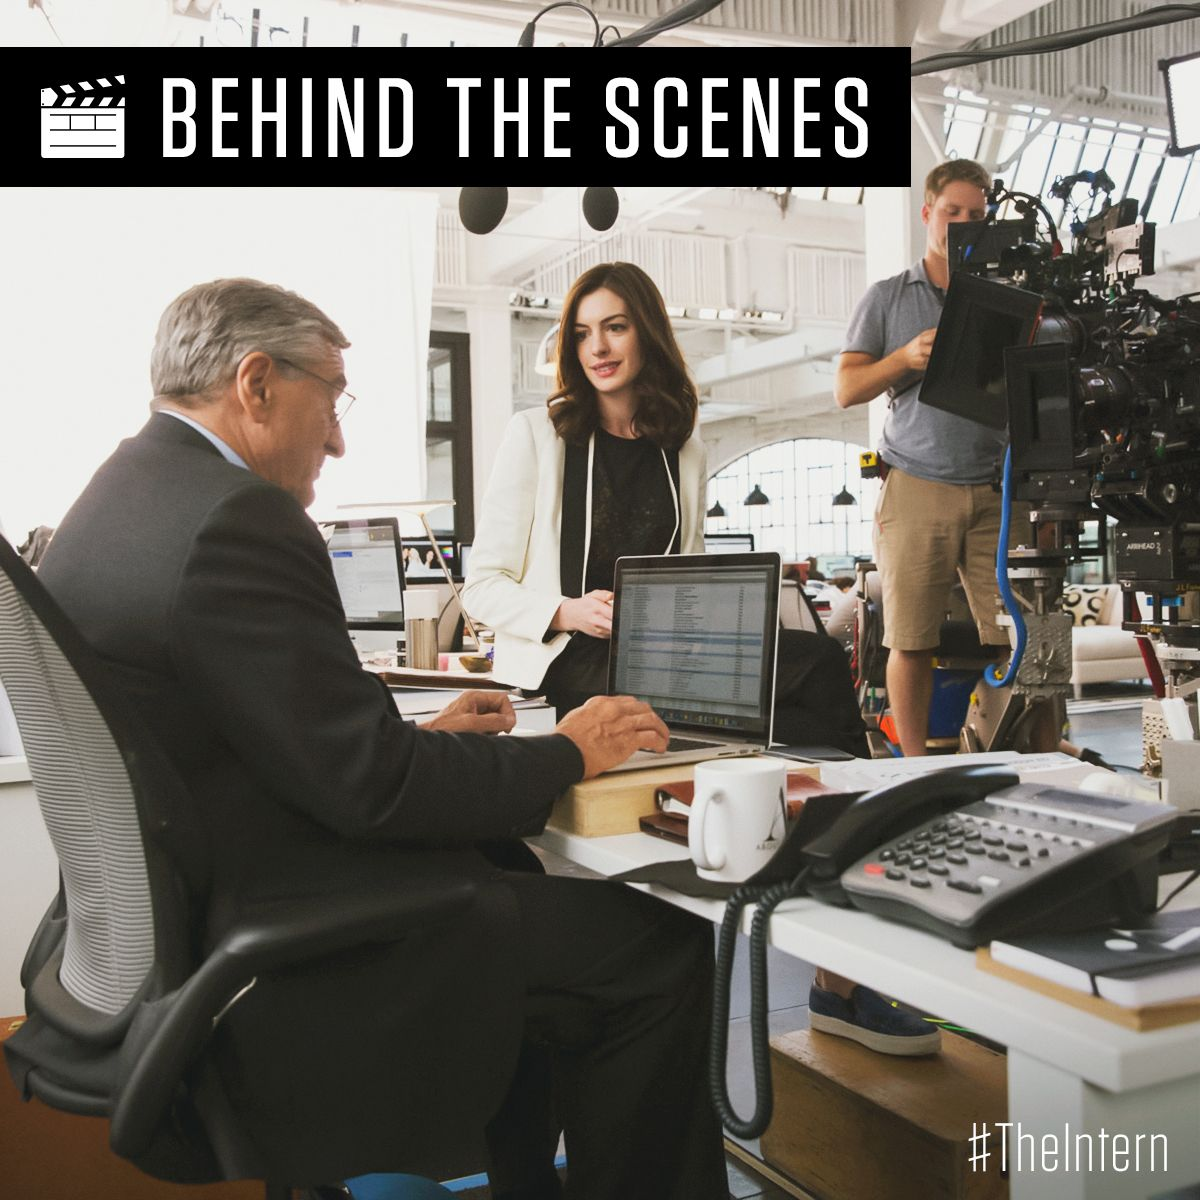 Anne Hathaway And Robert De Niro: #tbt To Anne Hathaway And Robert De Niro On Set Of